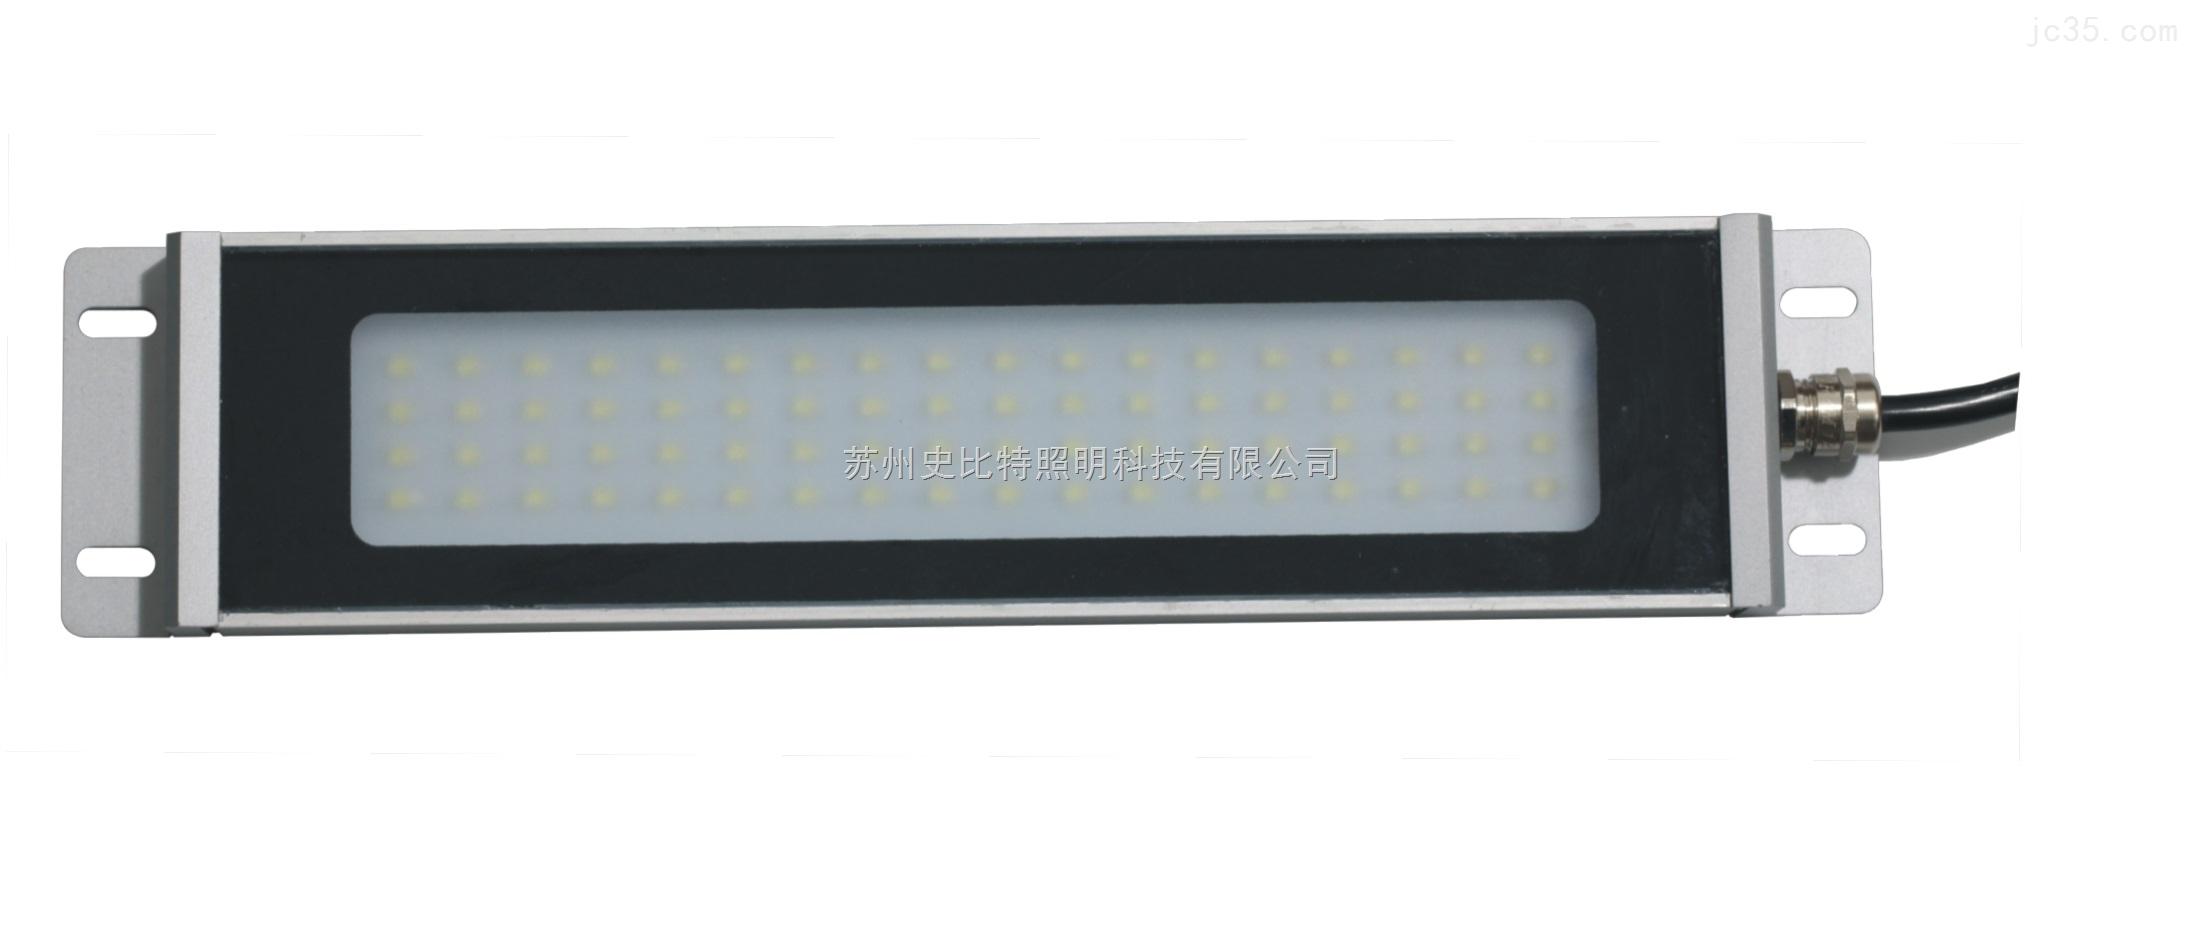 LED POWER 03系列-LED超薄灯